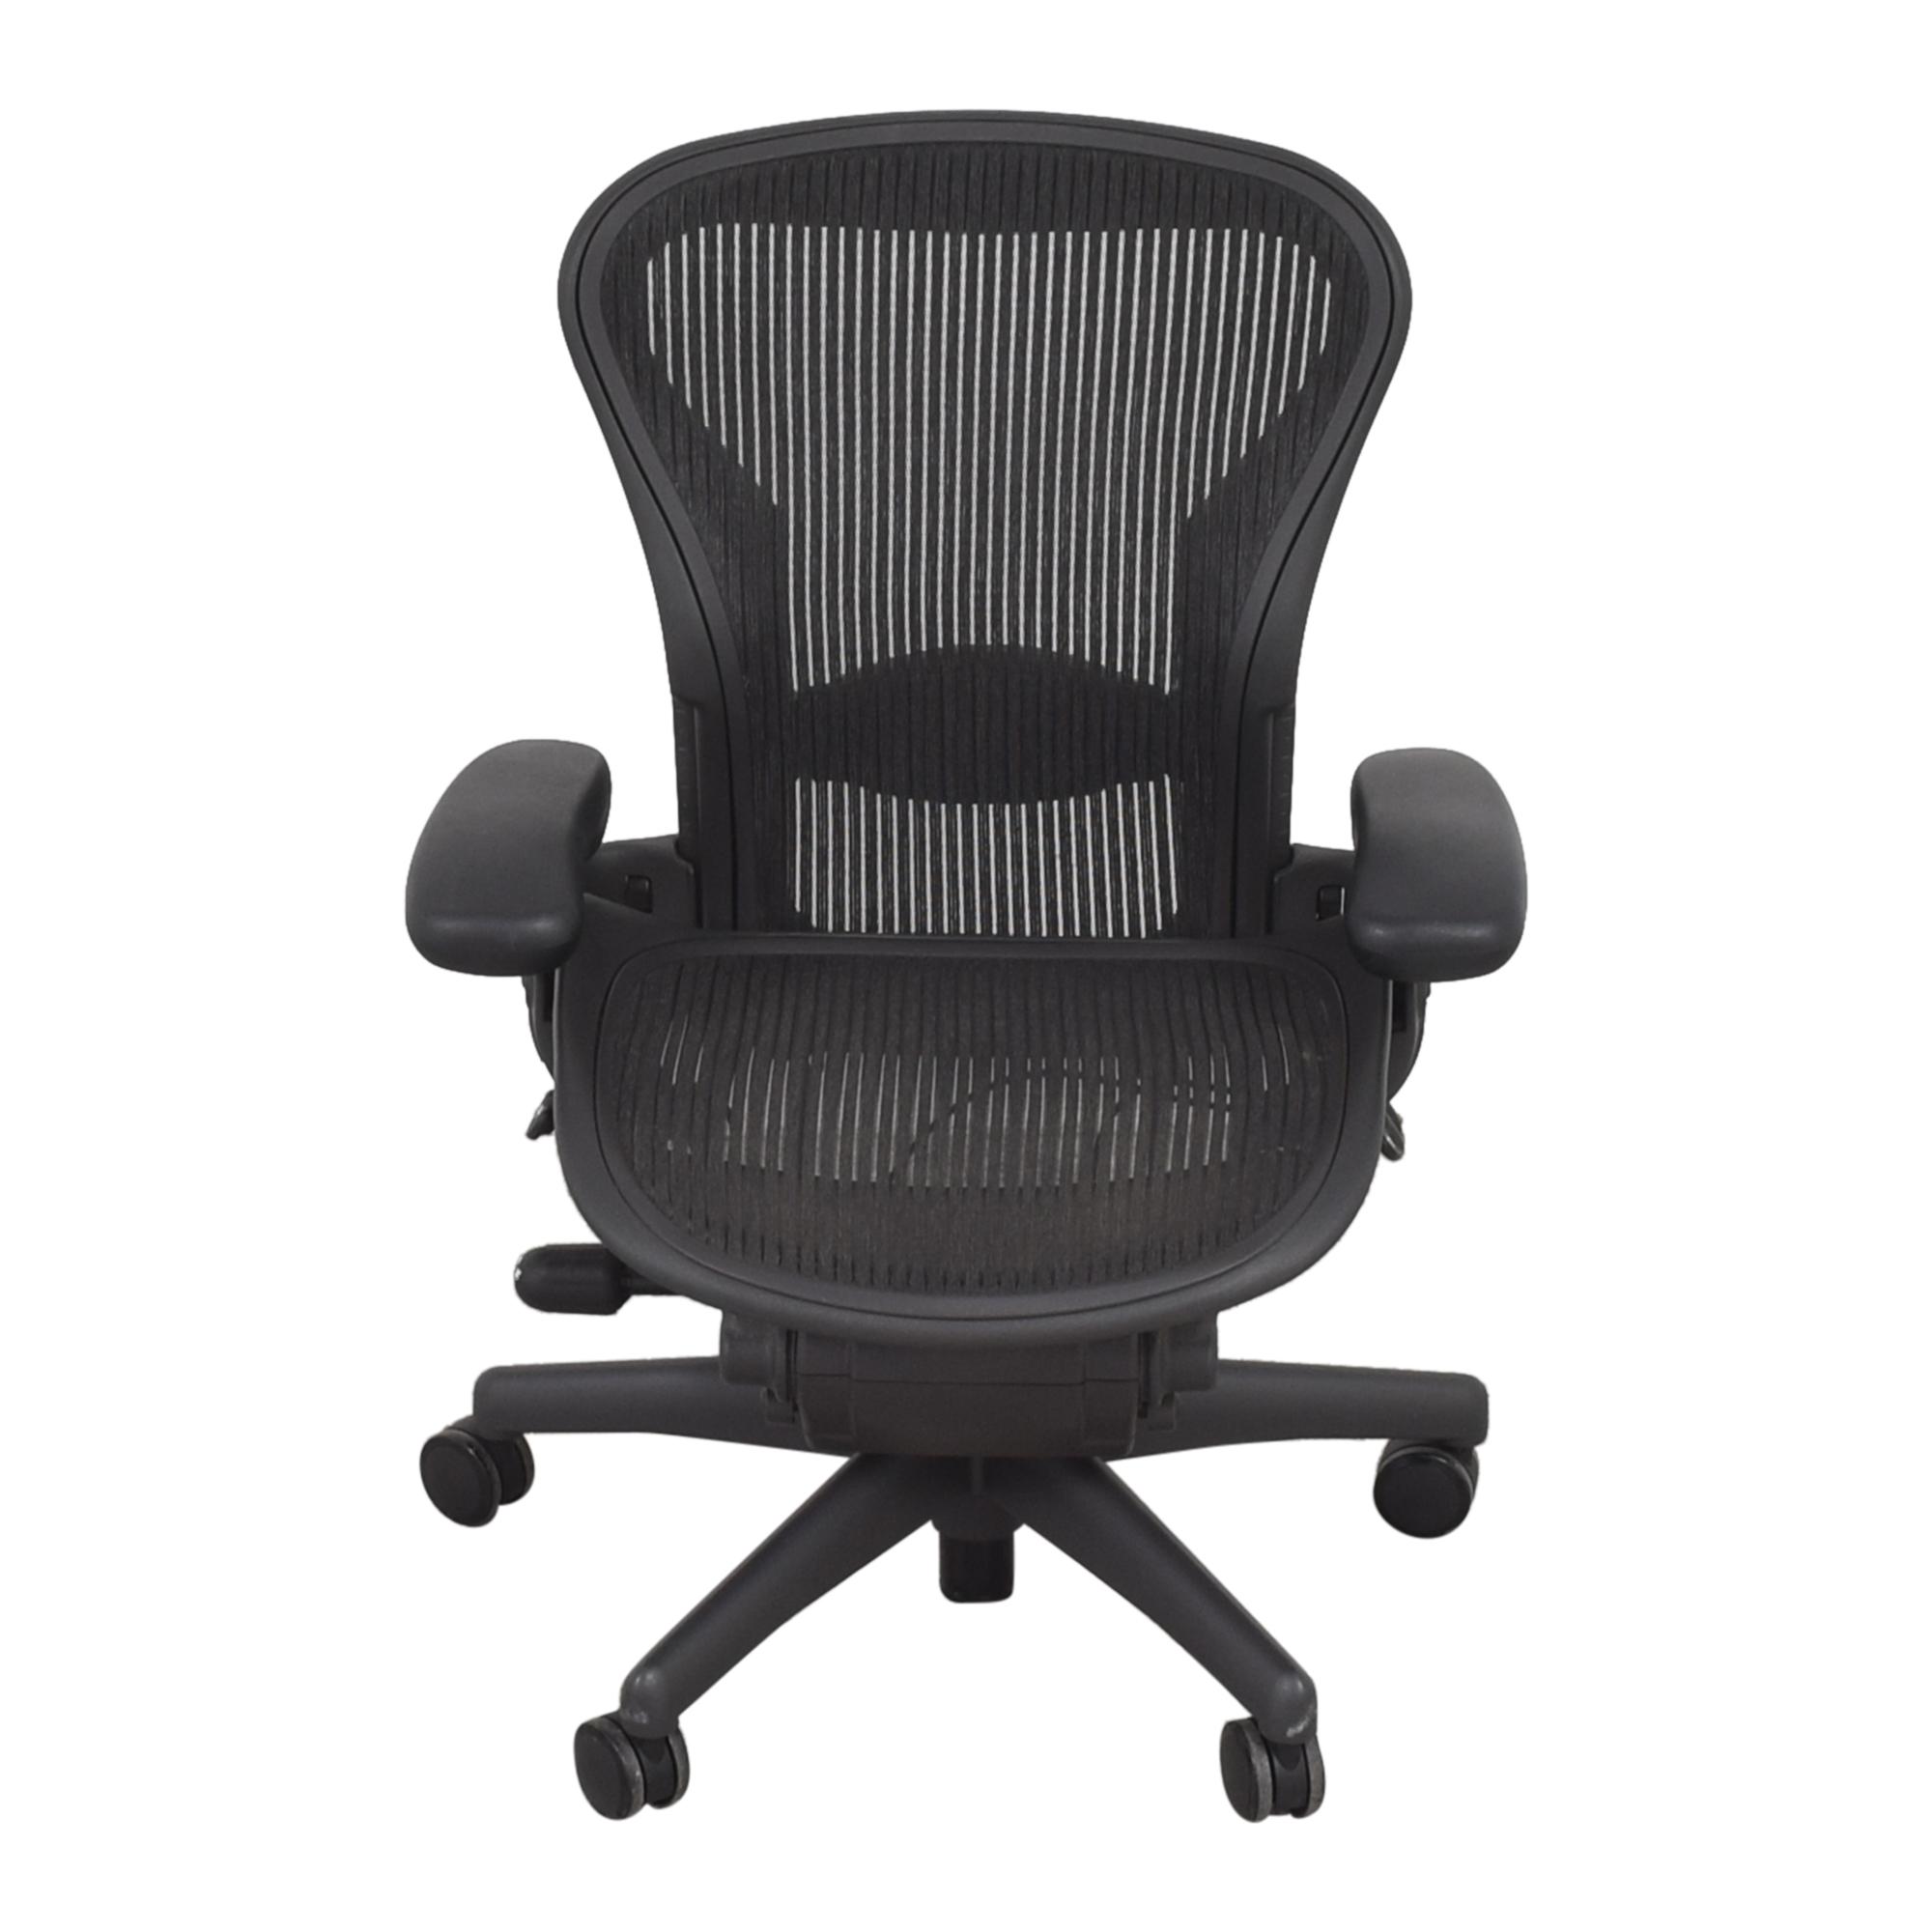 Herman Miller Herman Miller Size A Aeron Chair discount